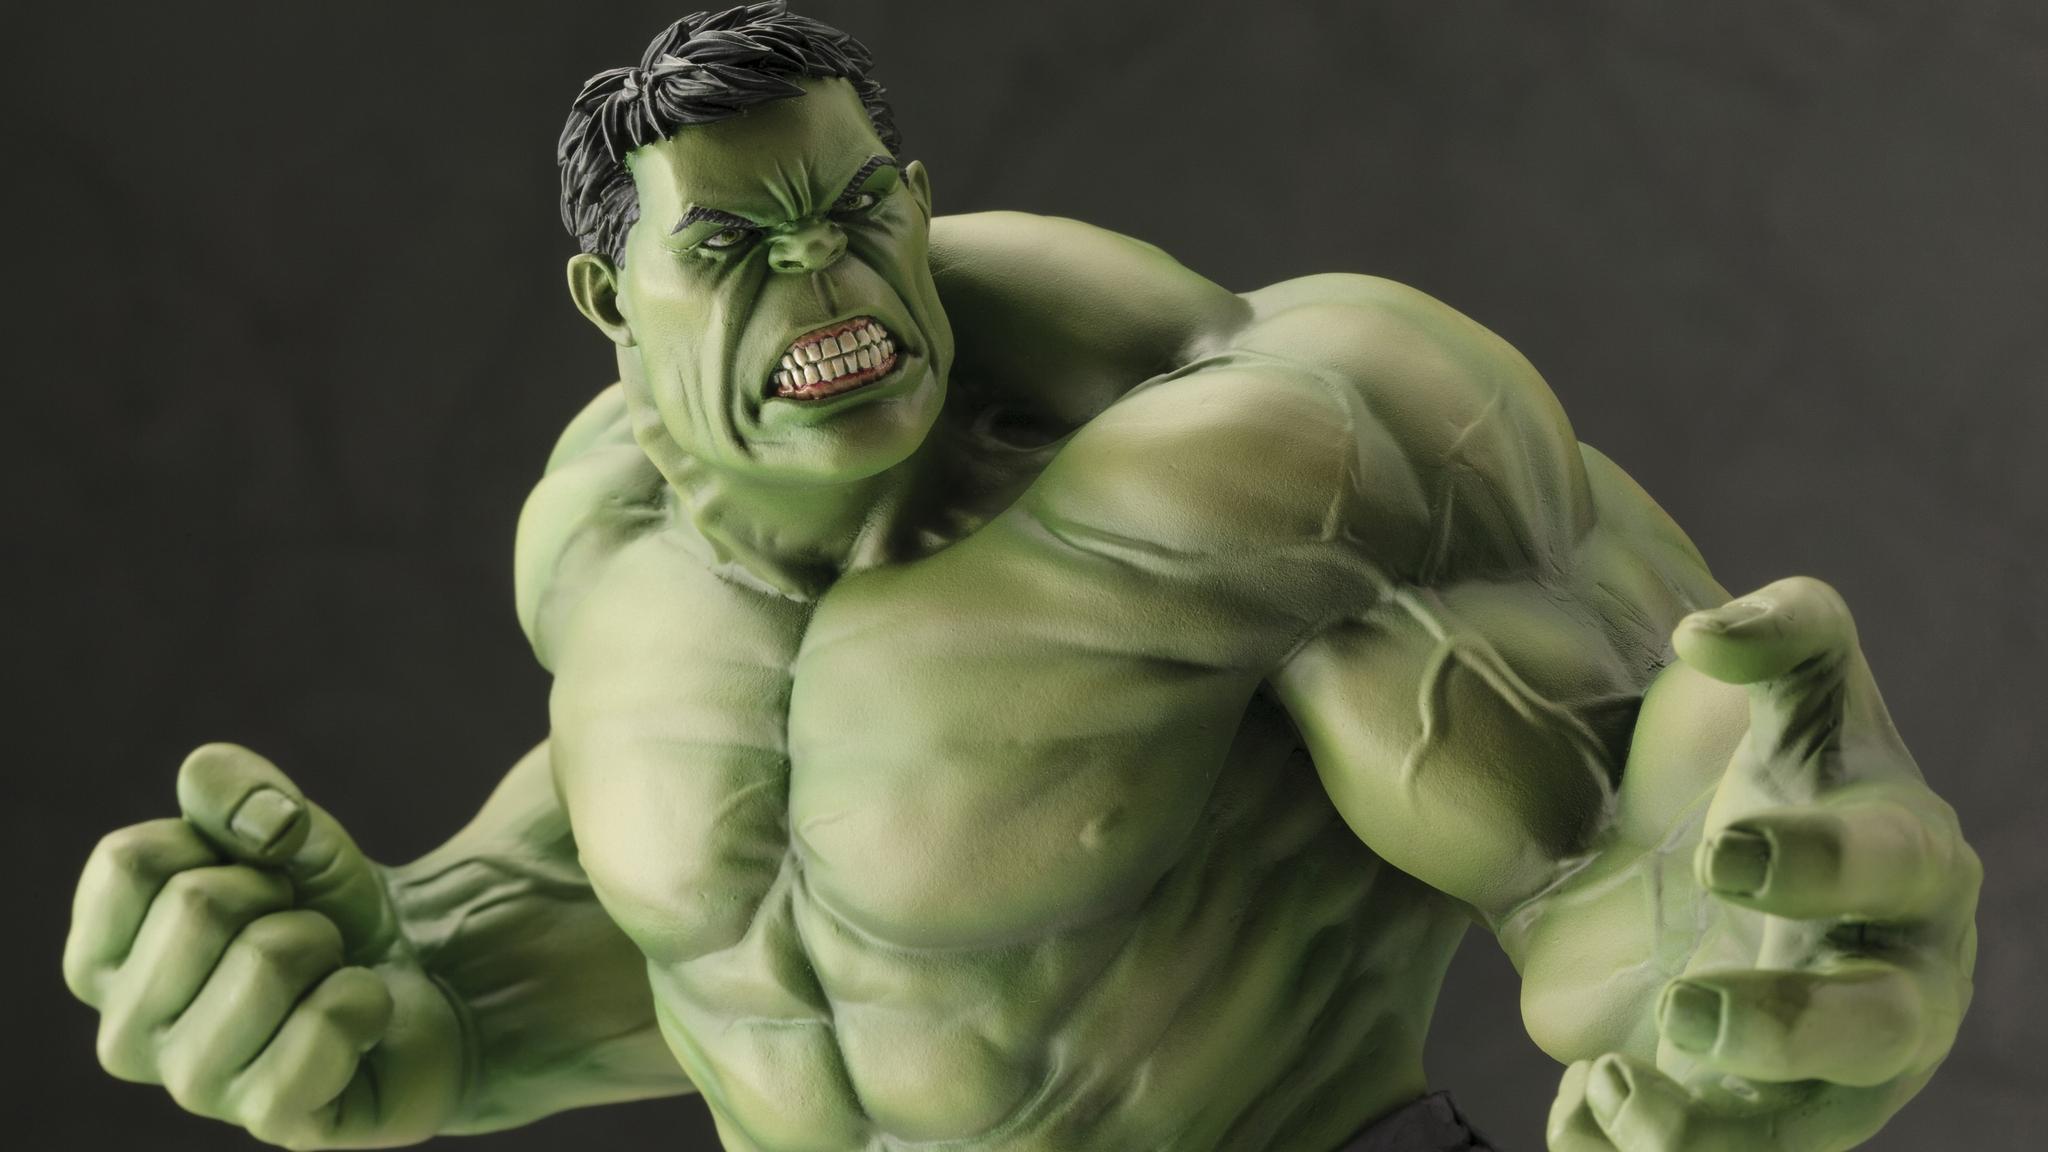 2048x1152 Hulk 2048x1152 Resolution Hd 4k Wallpapers Images